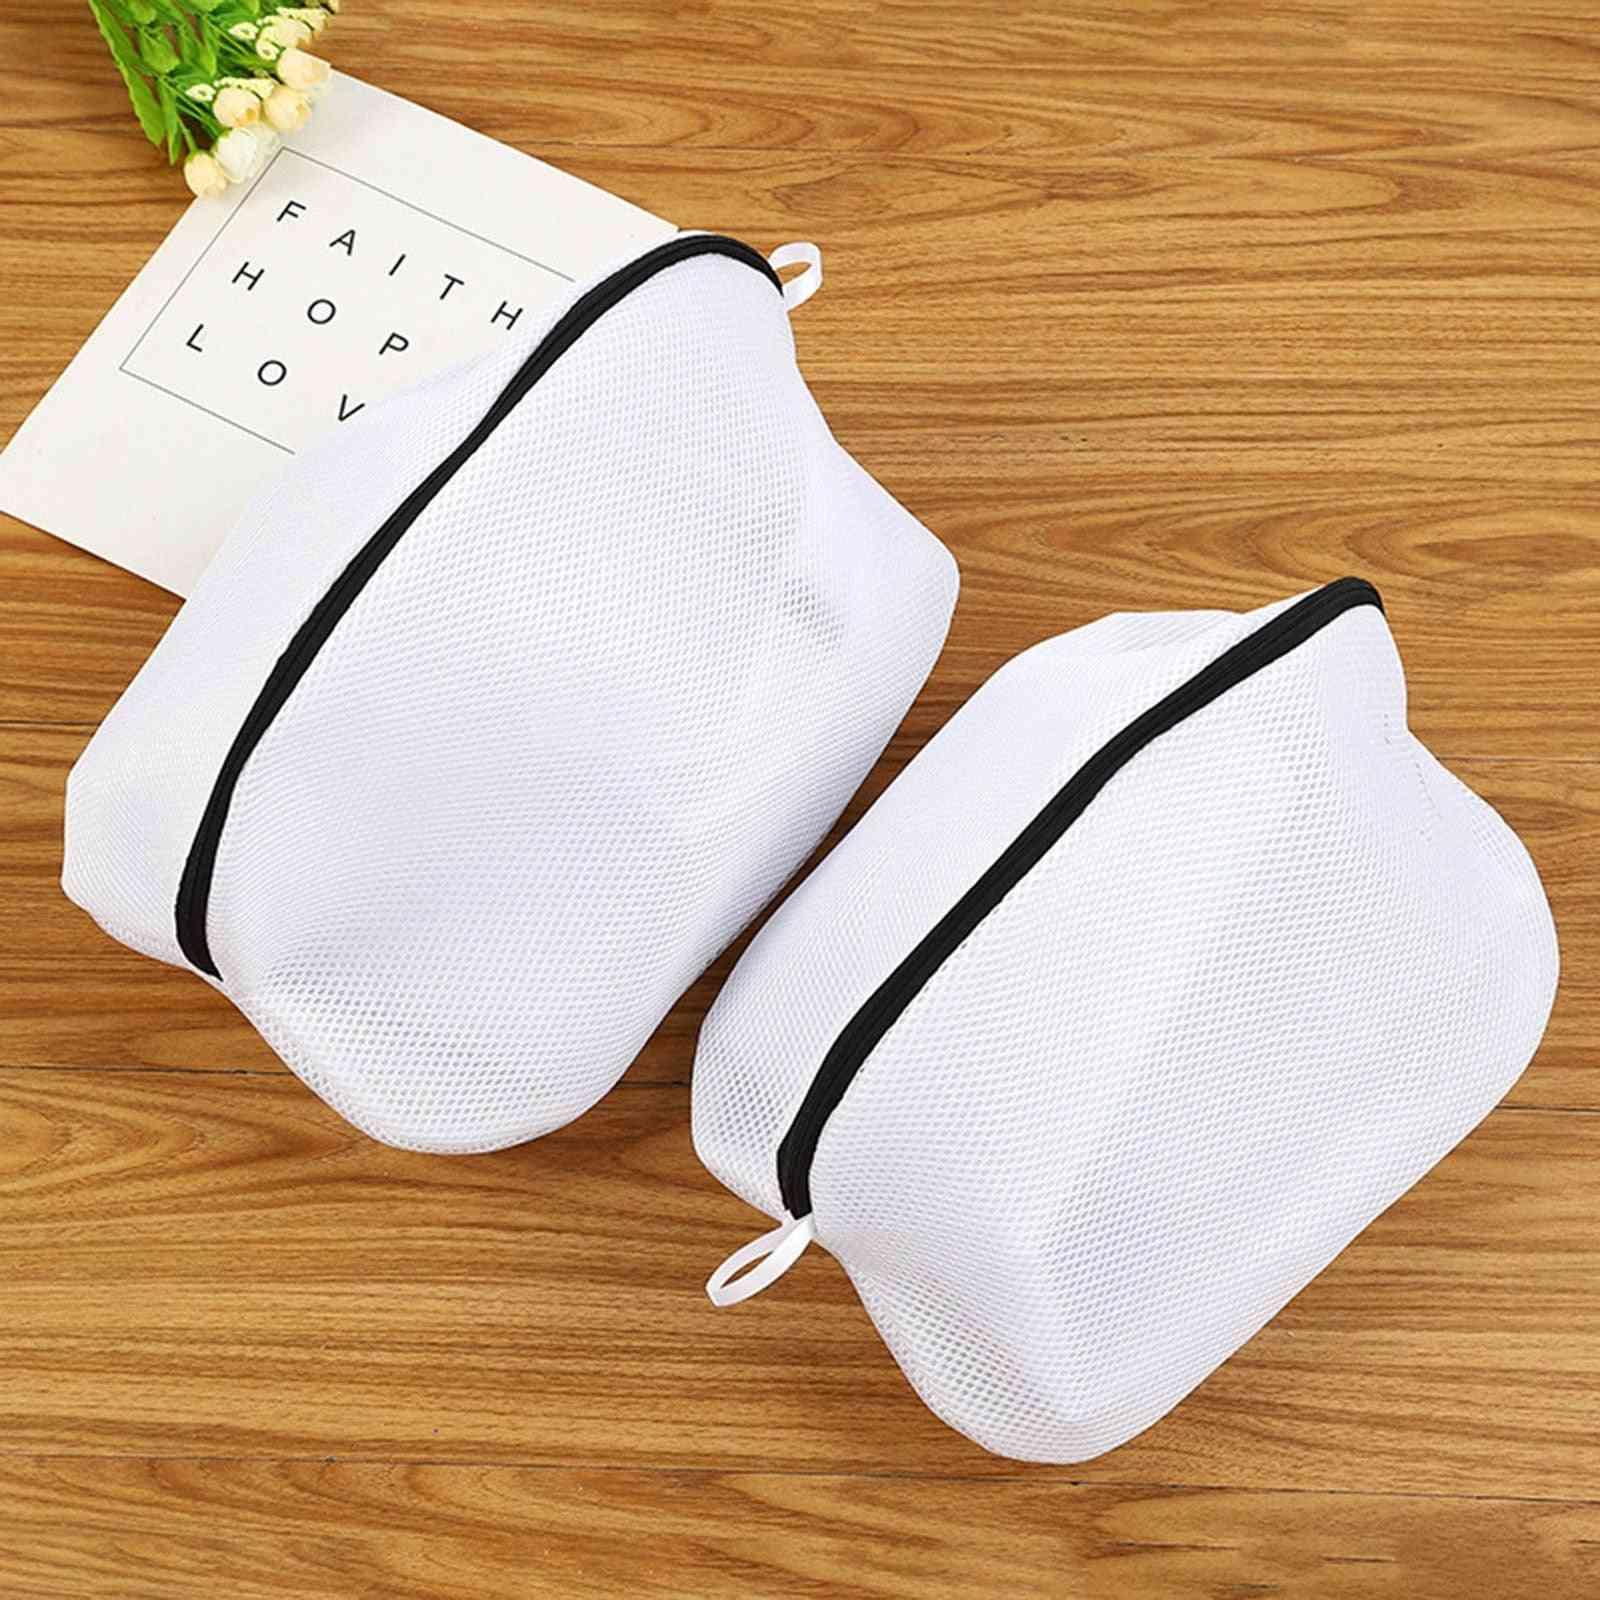 25# Women Bra Underwear Lingerie Laundry Washing Bags Hosiery Saver Bras Protector Mesh Clothes Sock Washing Aid Net Zip Bags